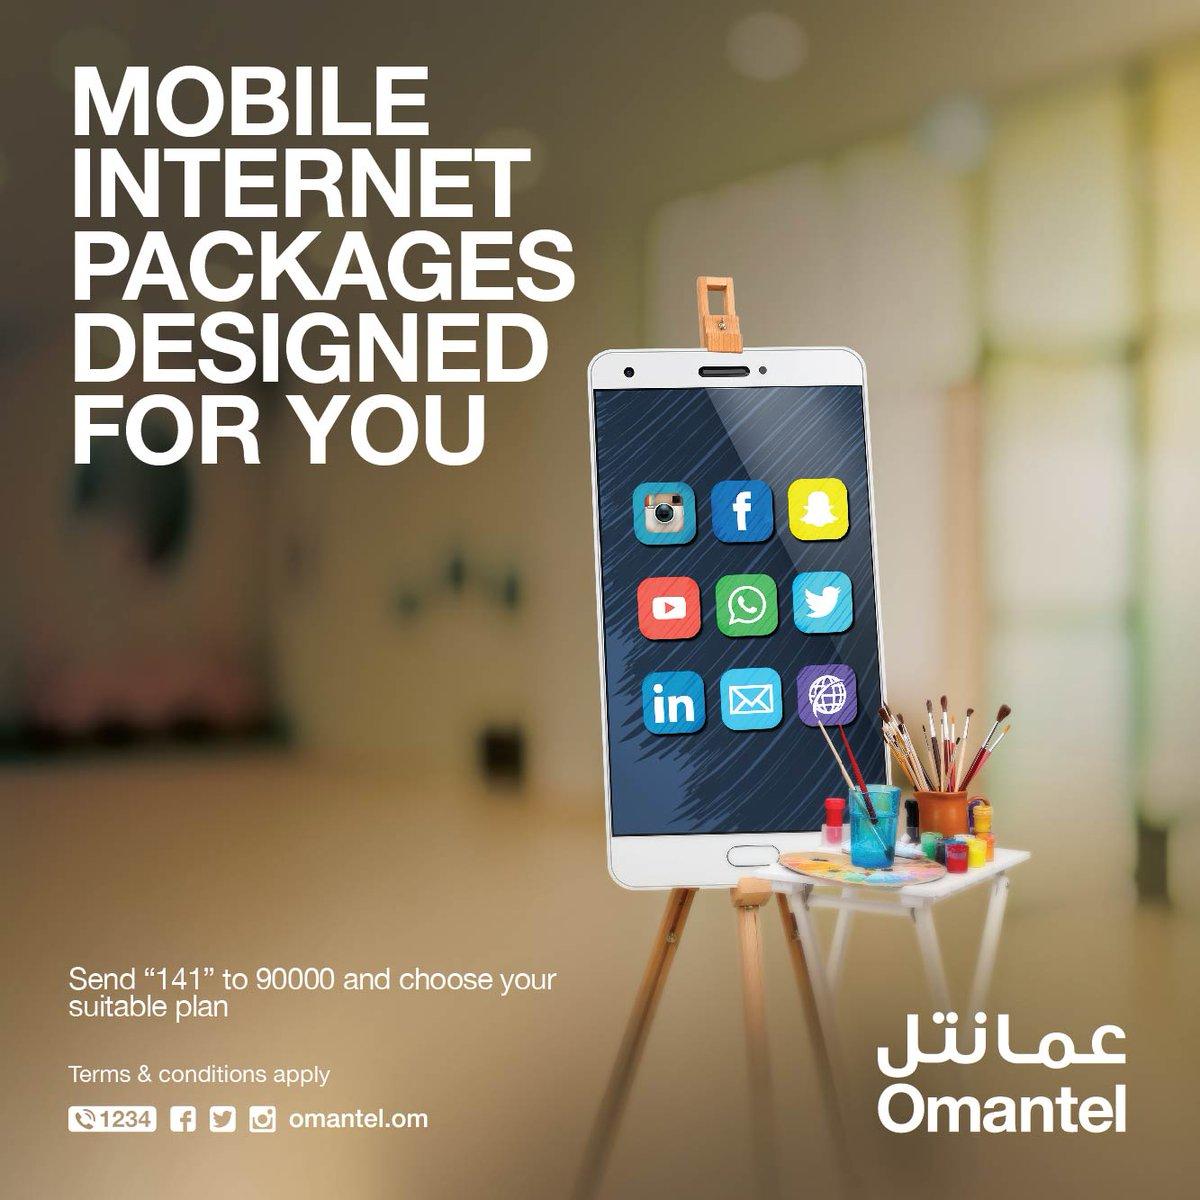 Omantel عمانتل on Twitter: